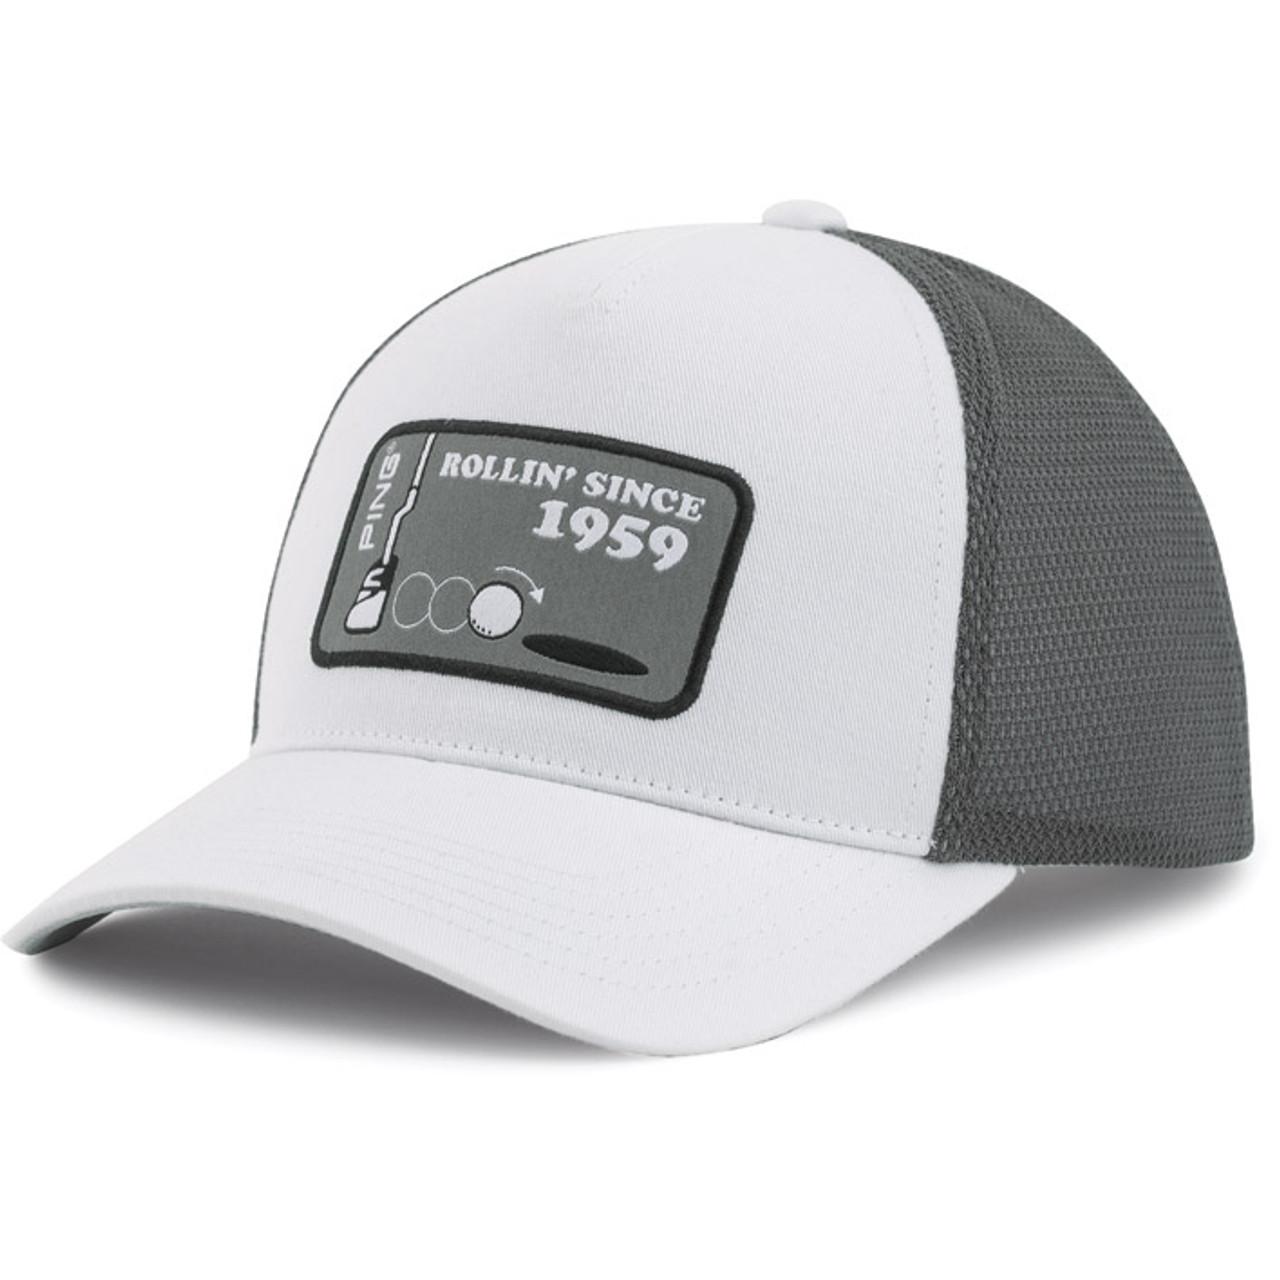 Ping Rollin 59 Cap - White